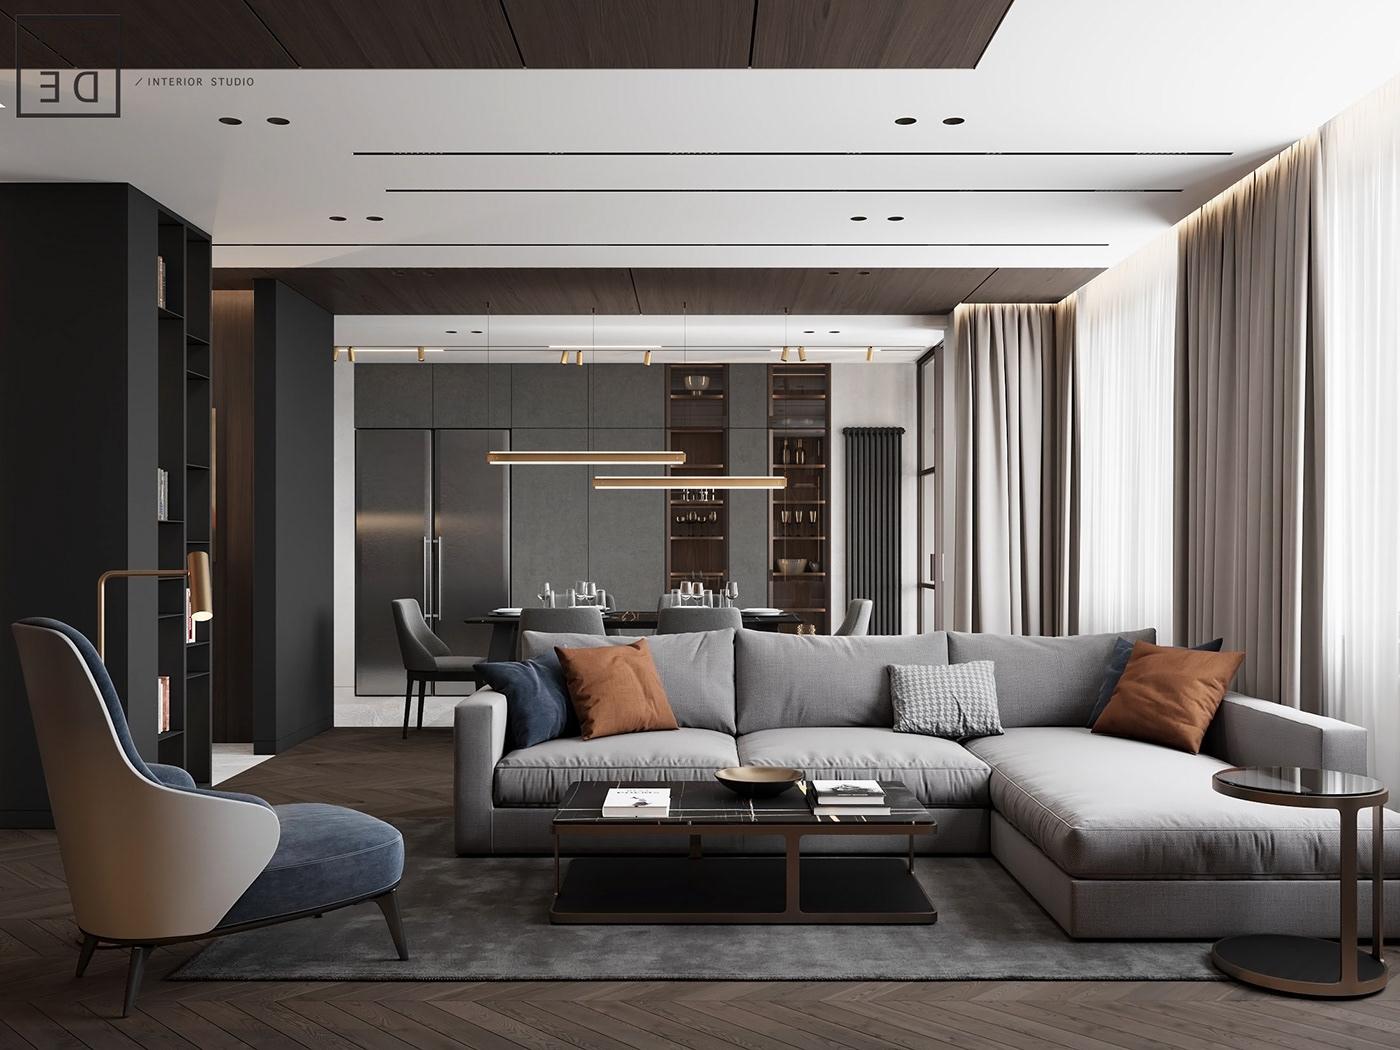 architecture architecture design corona render  DE&DE Interior Studio design Inetriordesign Interior Minimalism modern photoshop